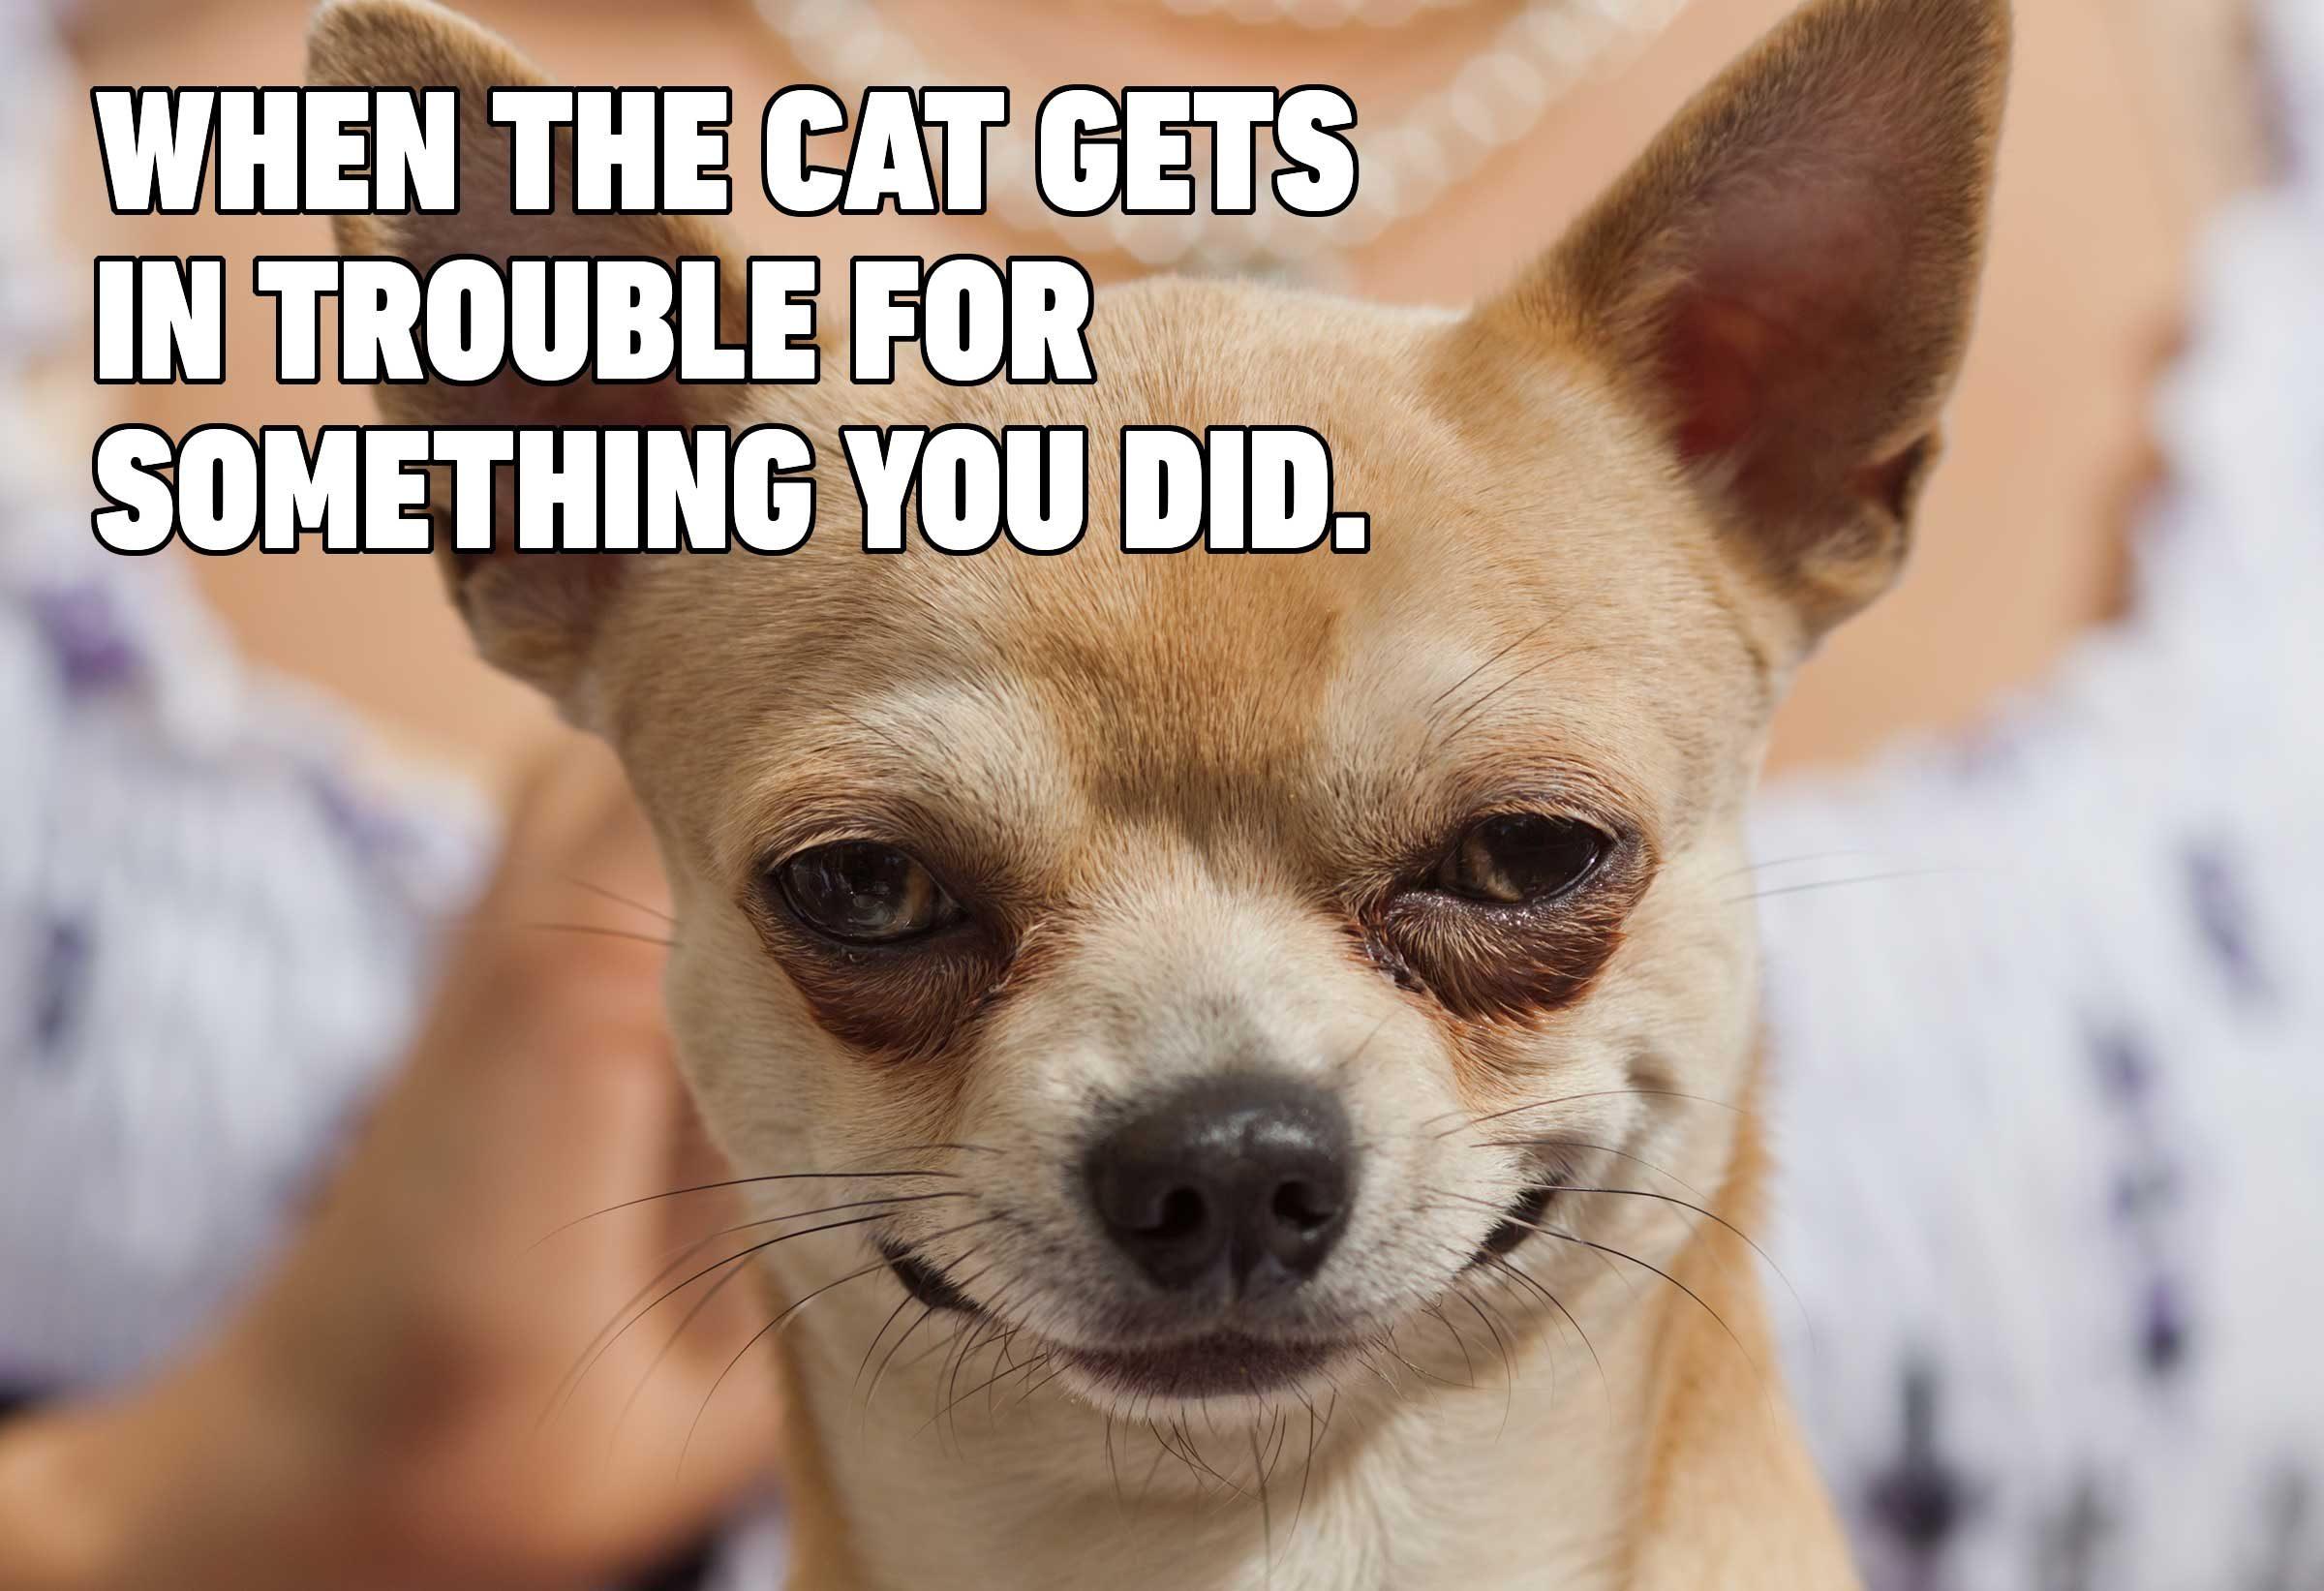 dog cat meme